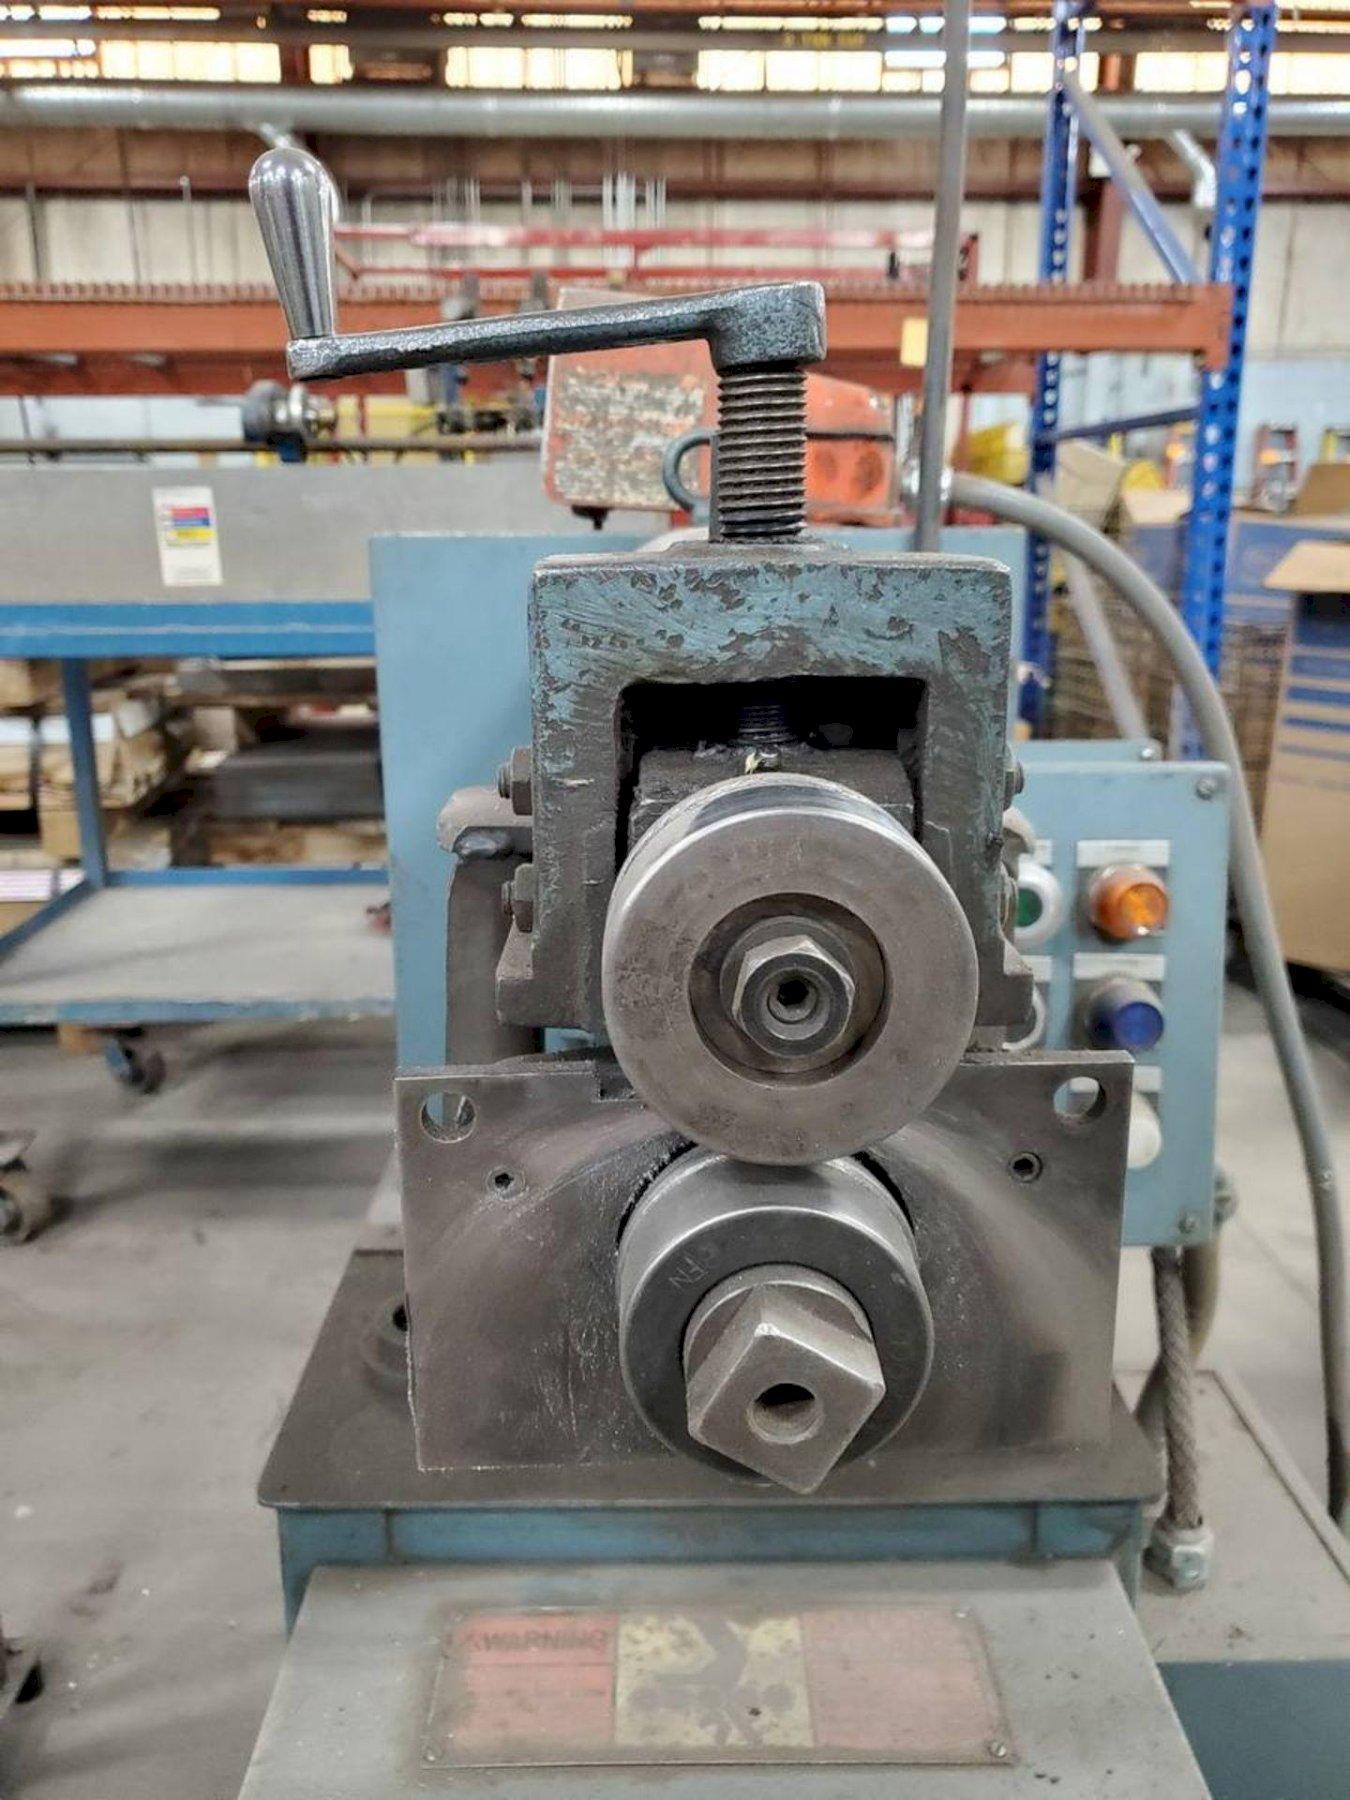 18 Ga RW Pexto Power Rotary Machine Model 3617